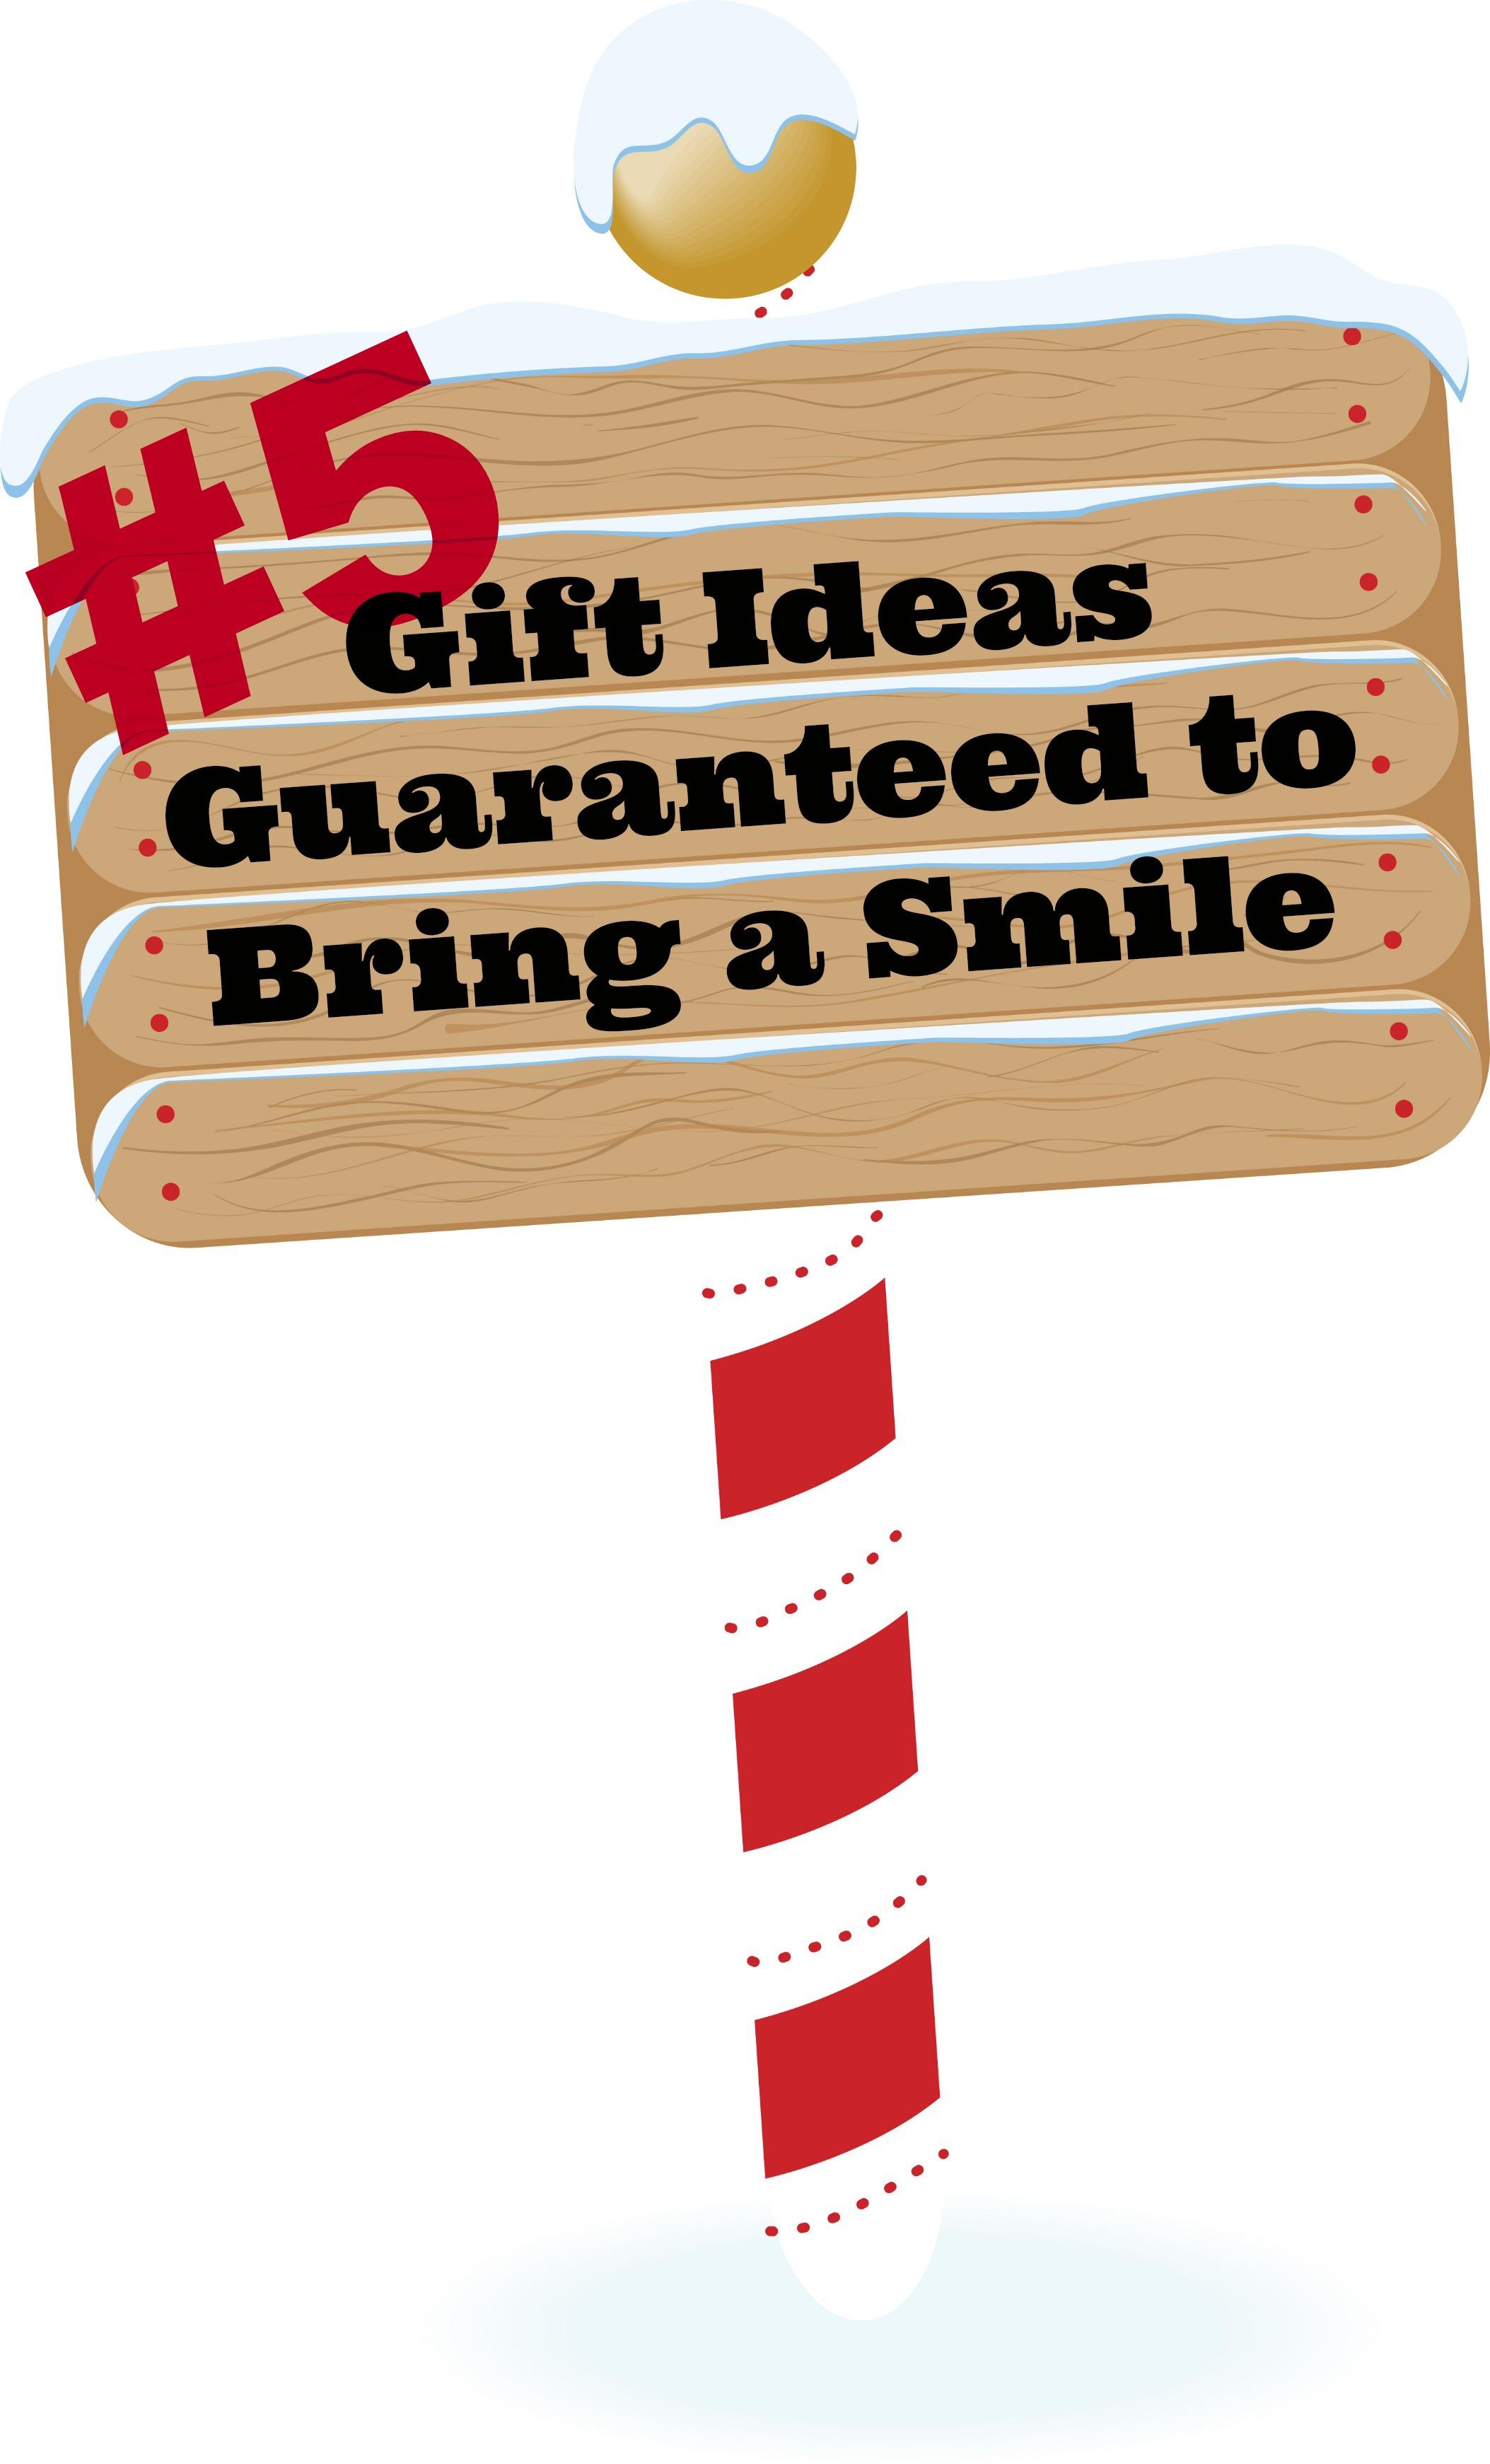 #5 Gift Idea